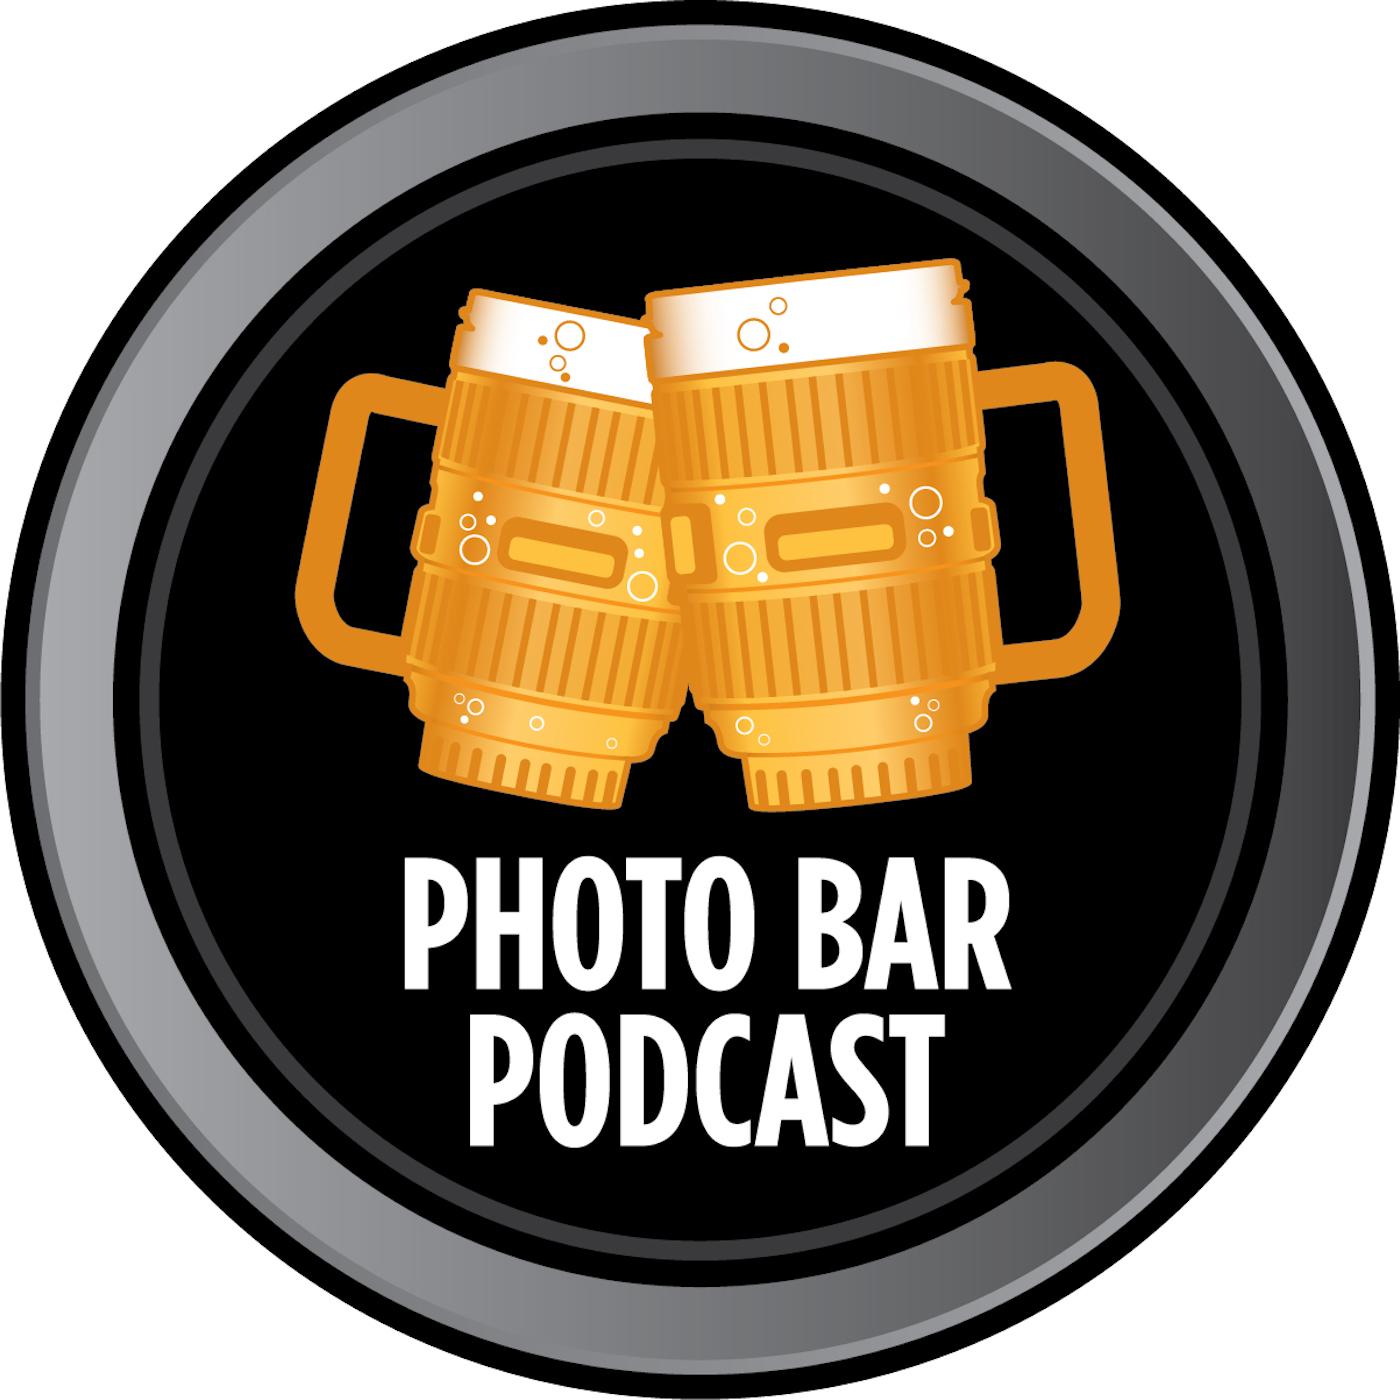 The Photo Bar Podcast show art